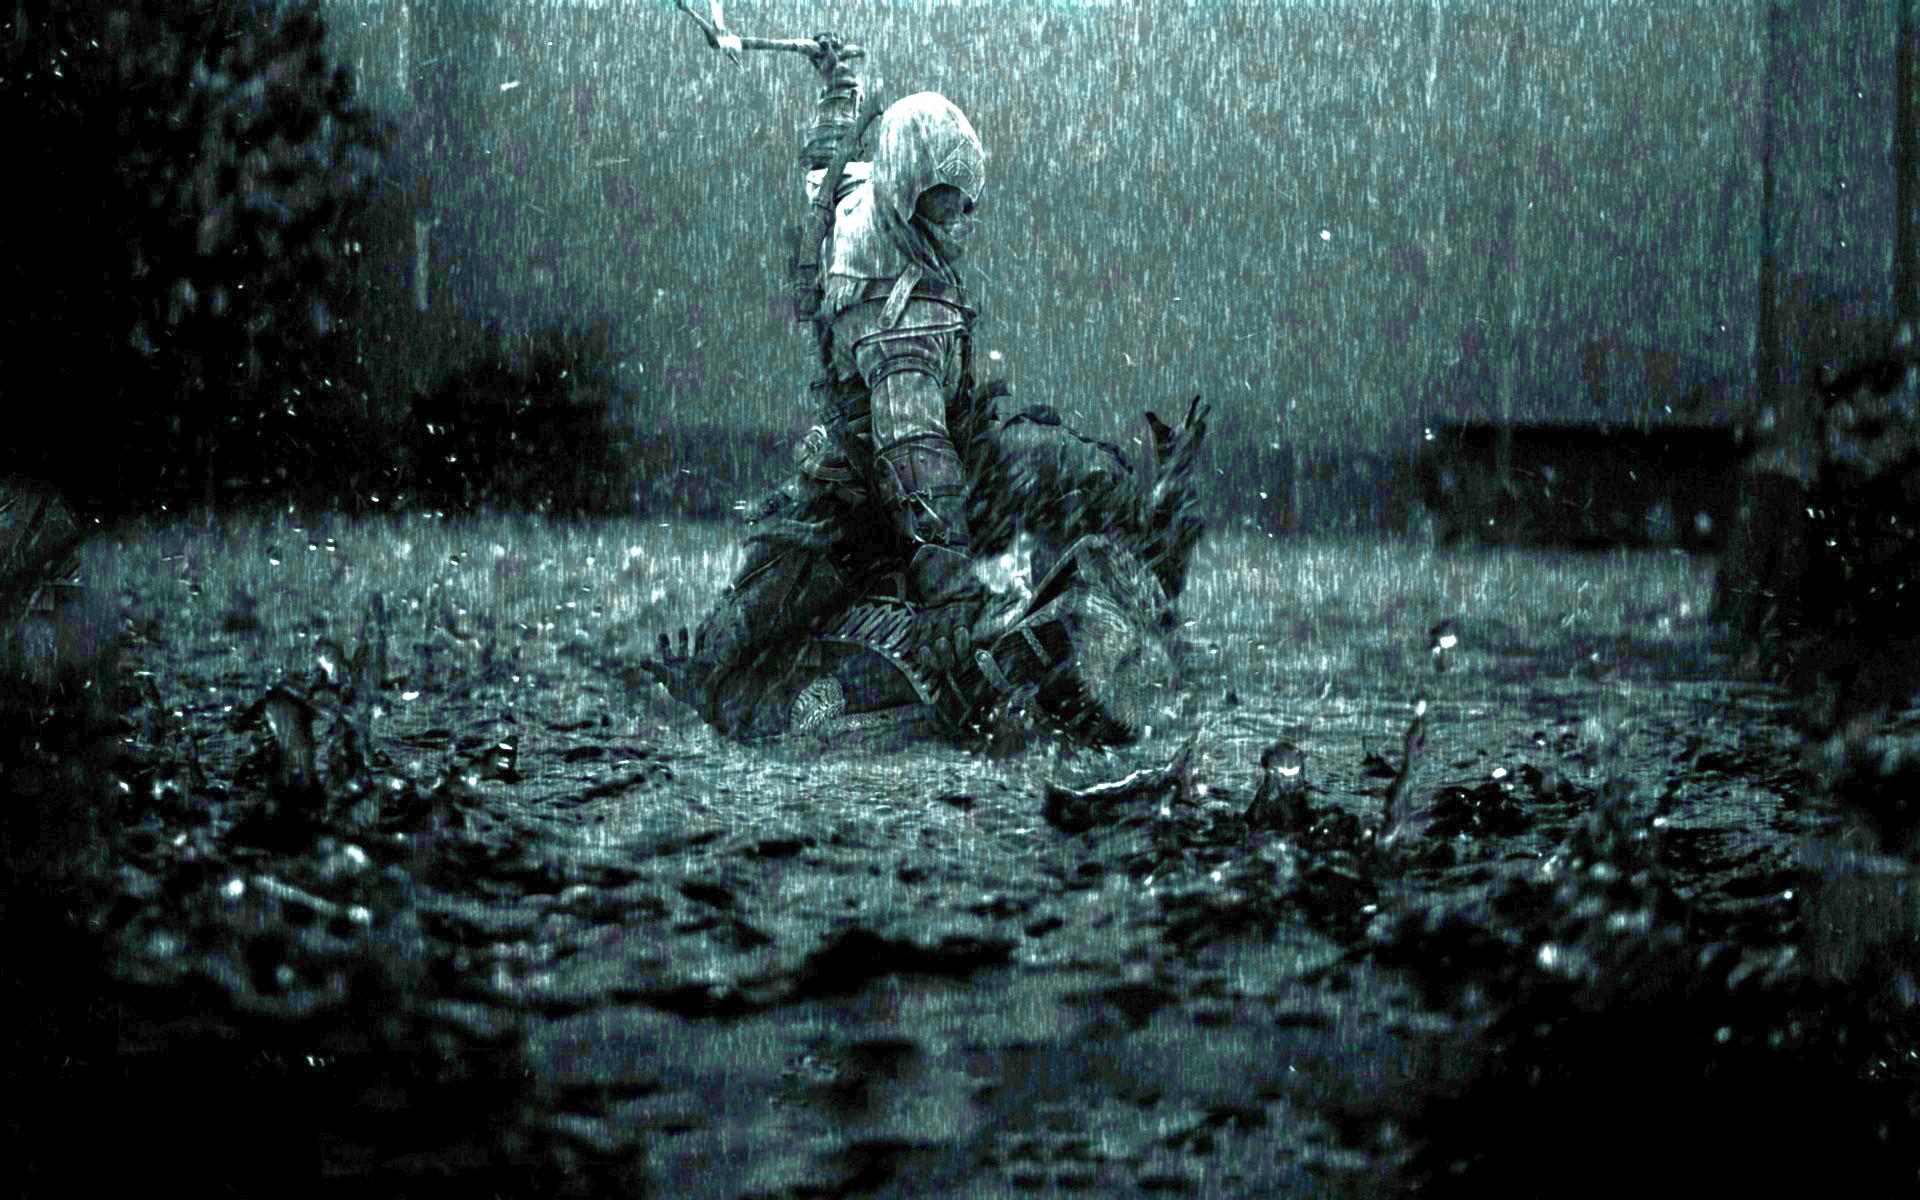 assassins creed rain art. Â«Â«